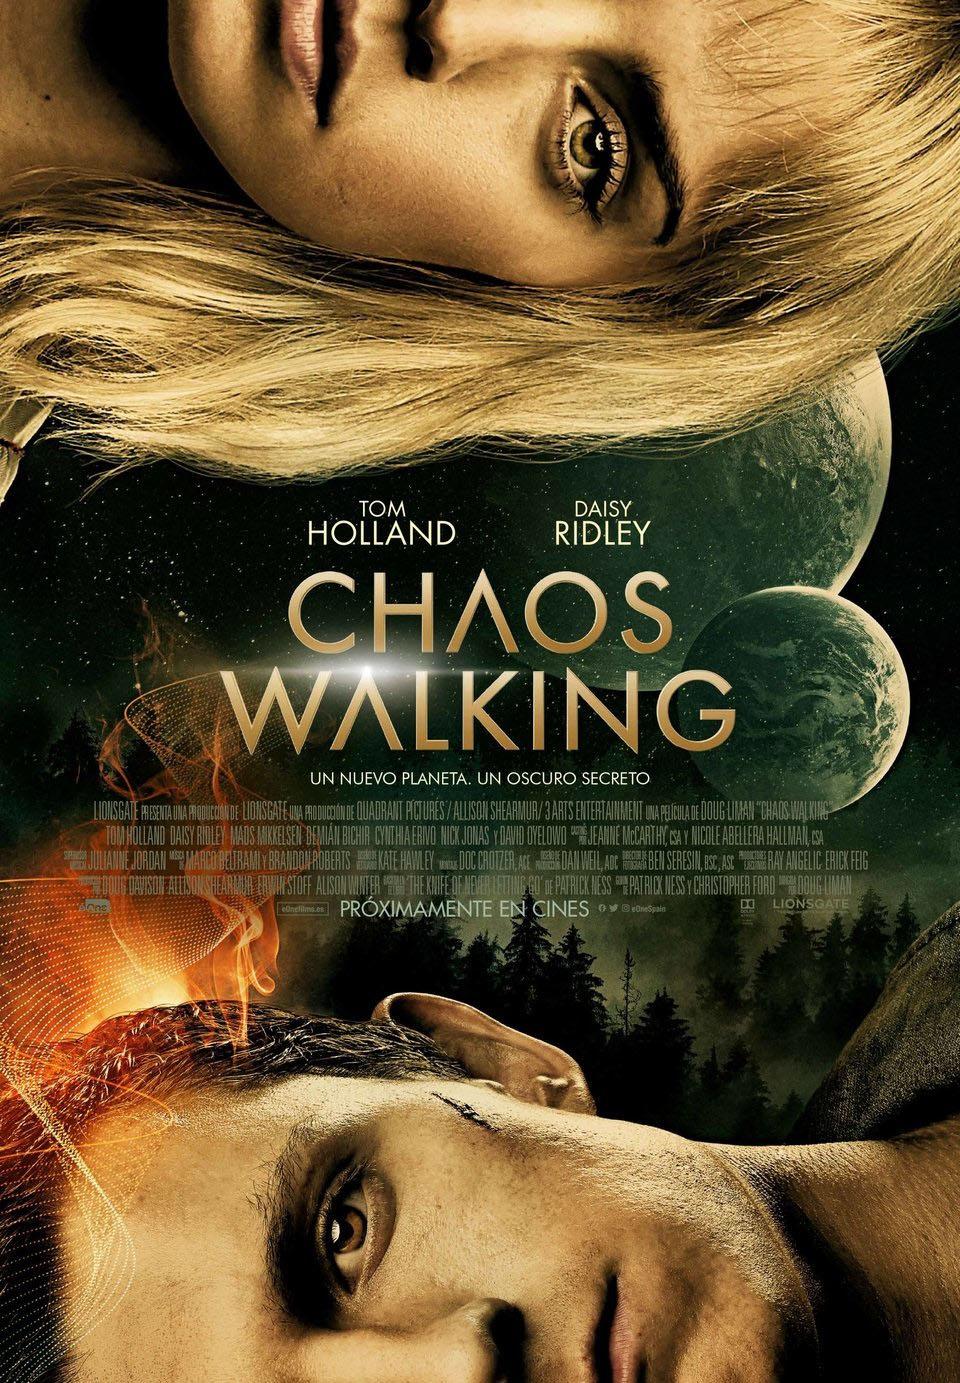 Cinema: CHAOS WALKING / 29-05-2021, a les 18 h - Teatre Auditori de l'Hospitalet de l'Infant